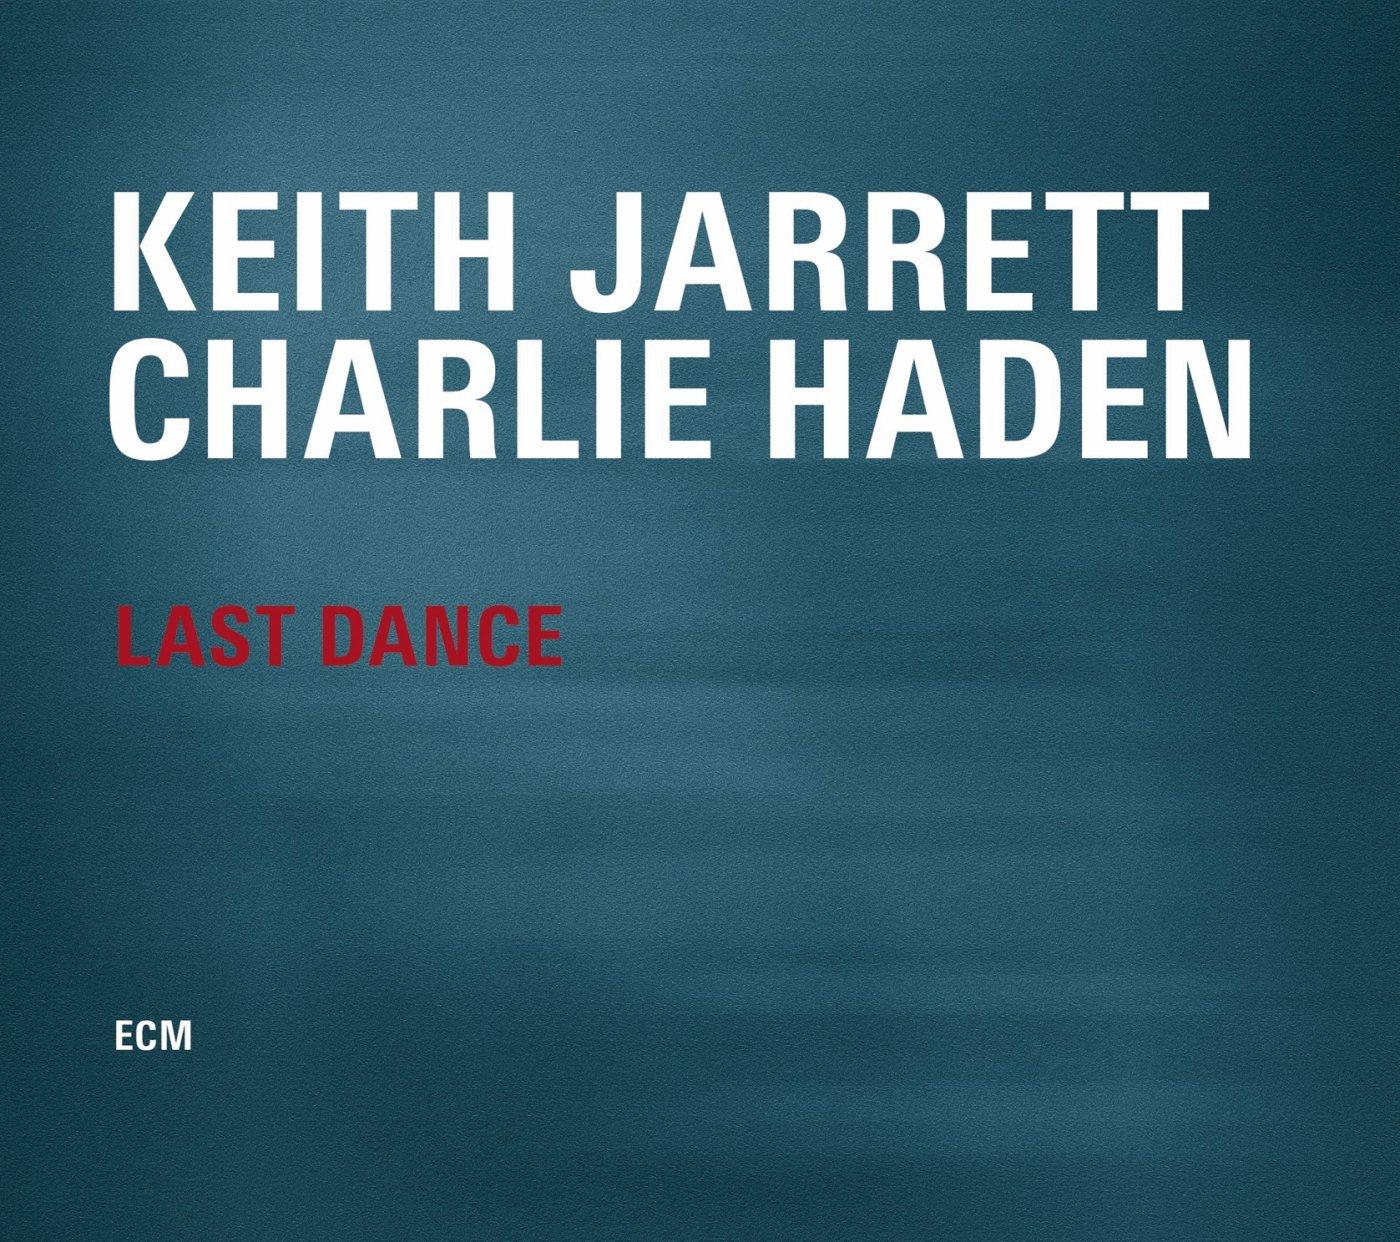 Keith Jarrett/Charlie Haden - Last Dance  cover